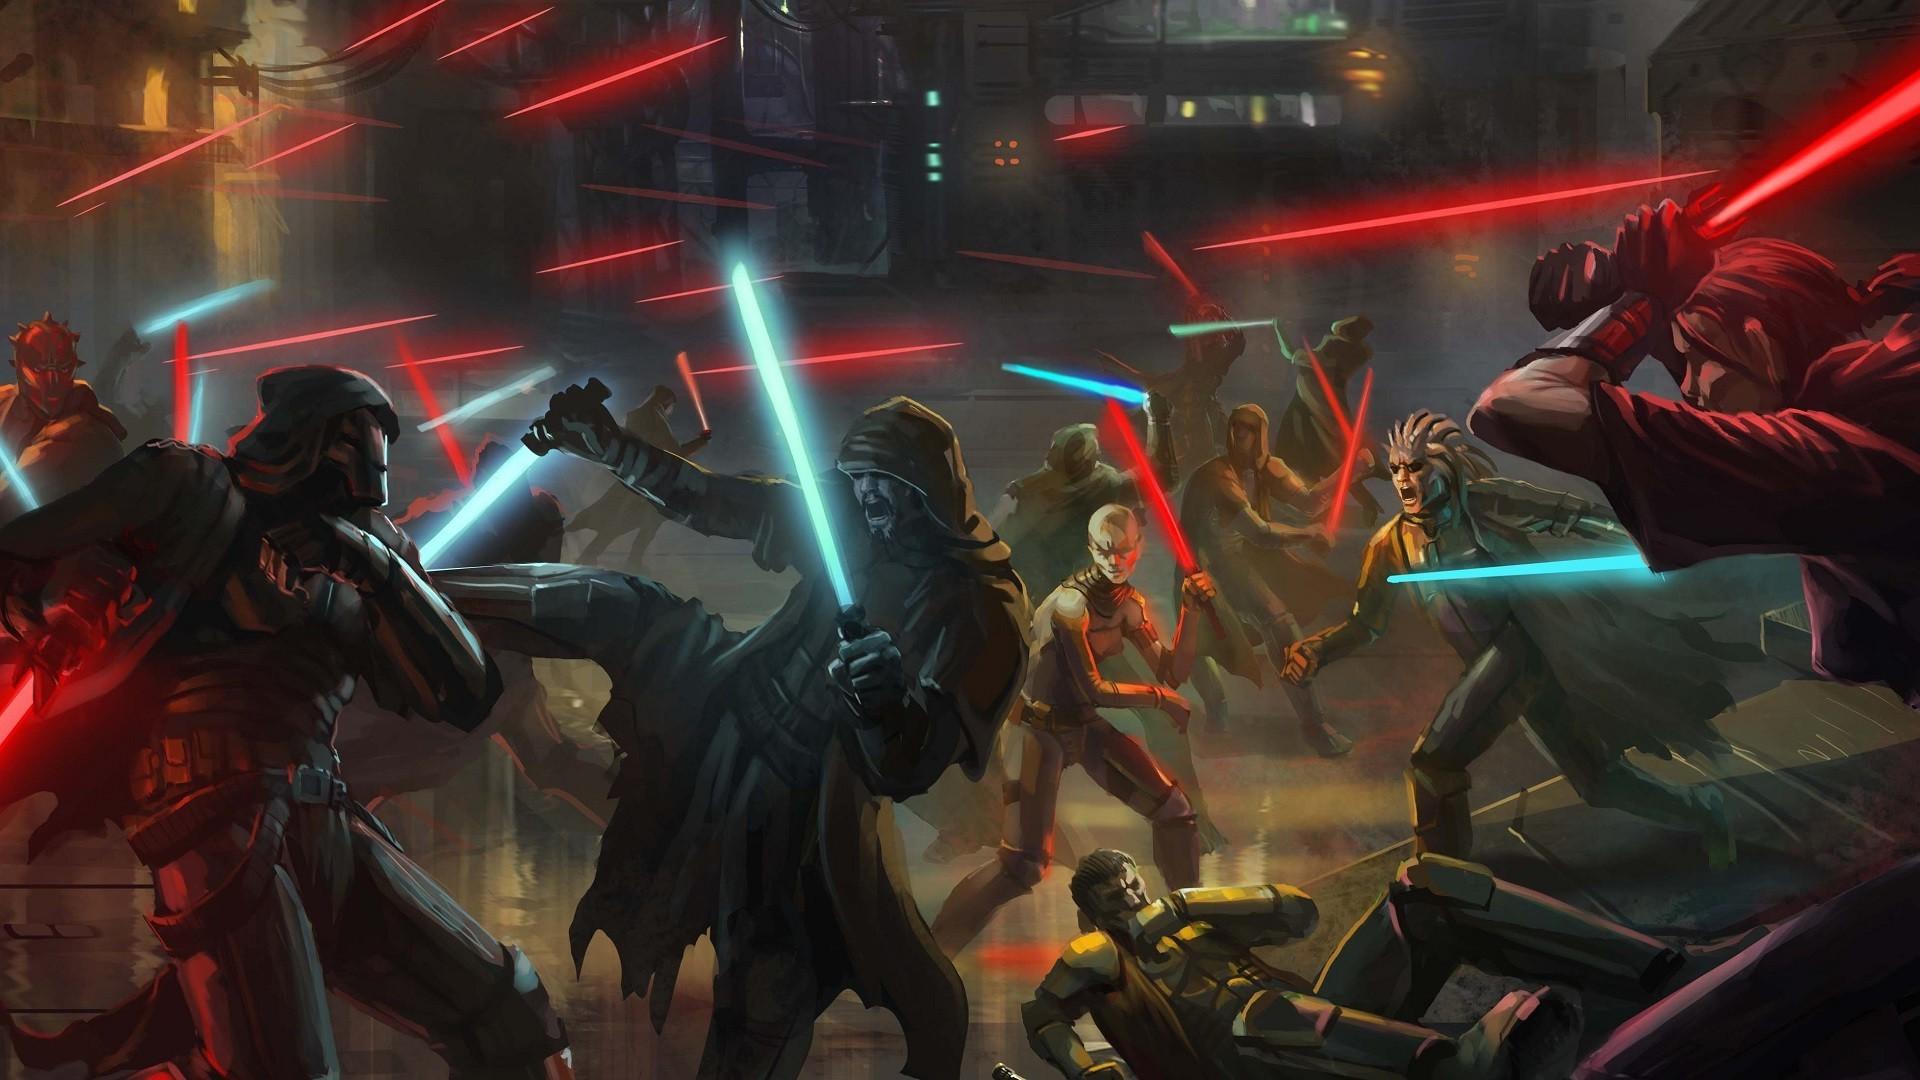 Star Wars, Lightsaber, Concept Art, Science Fiction Wallpapers HD / Desktop  and Mobile Backgrounds